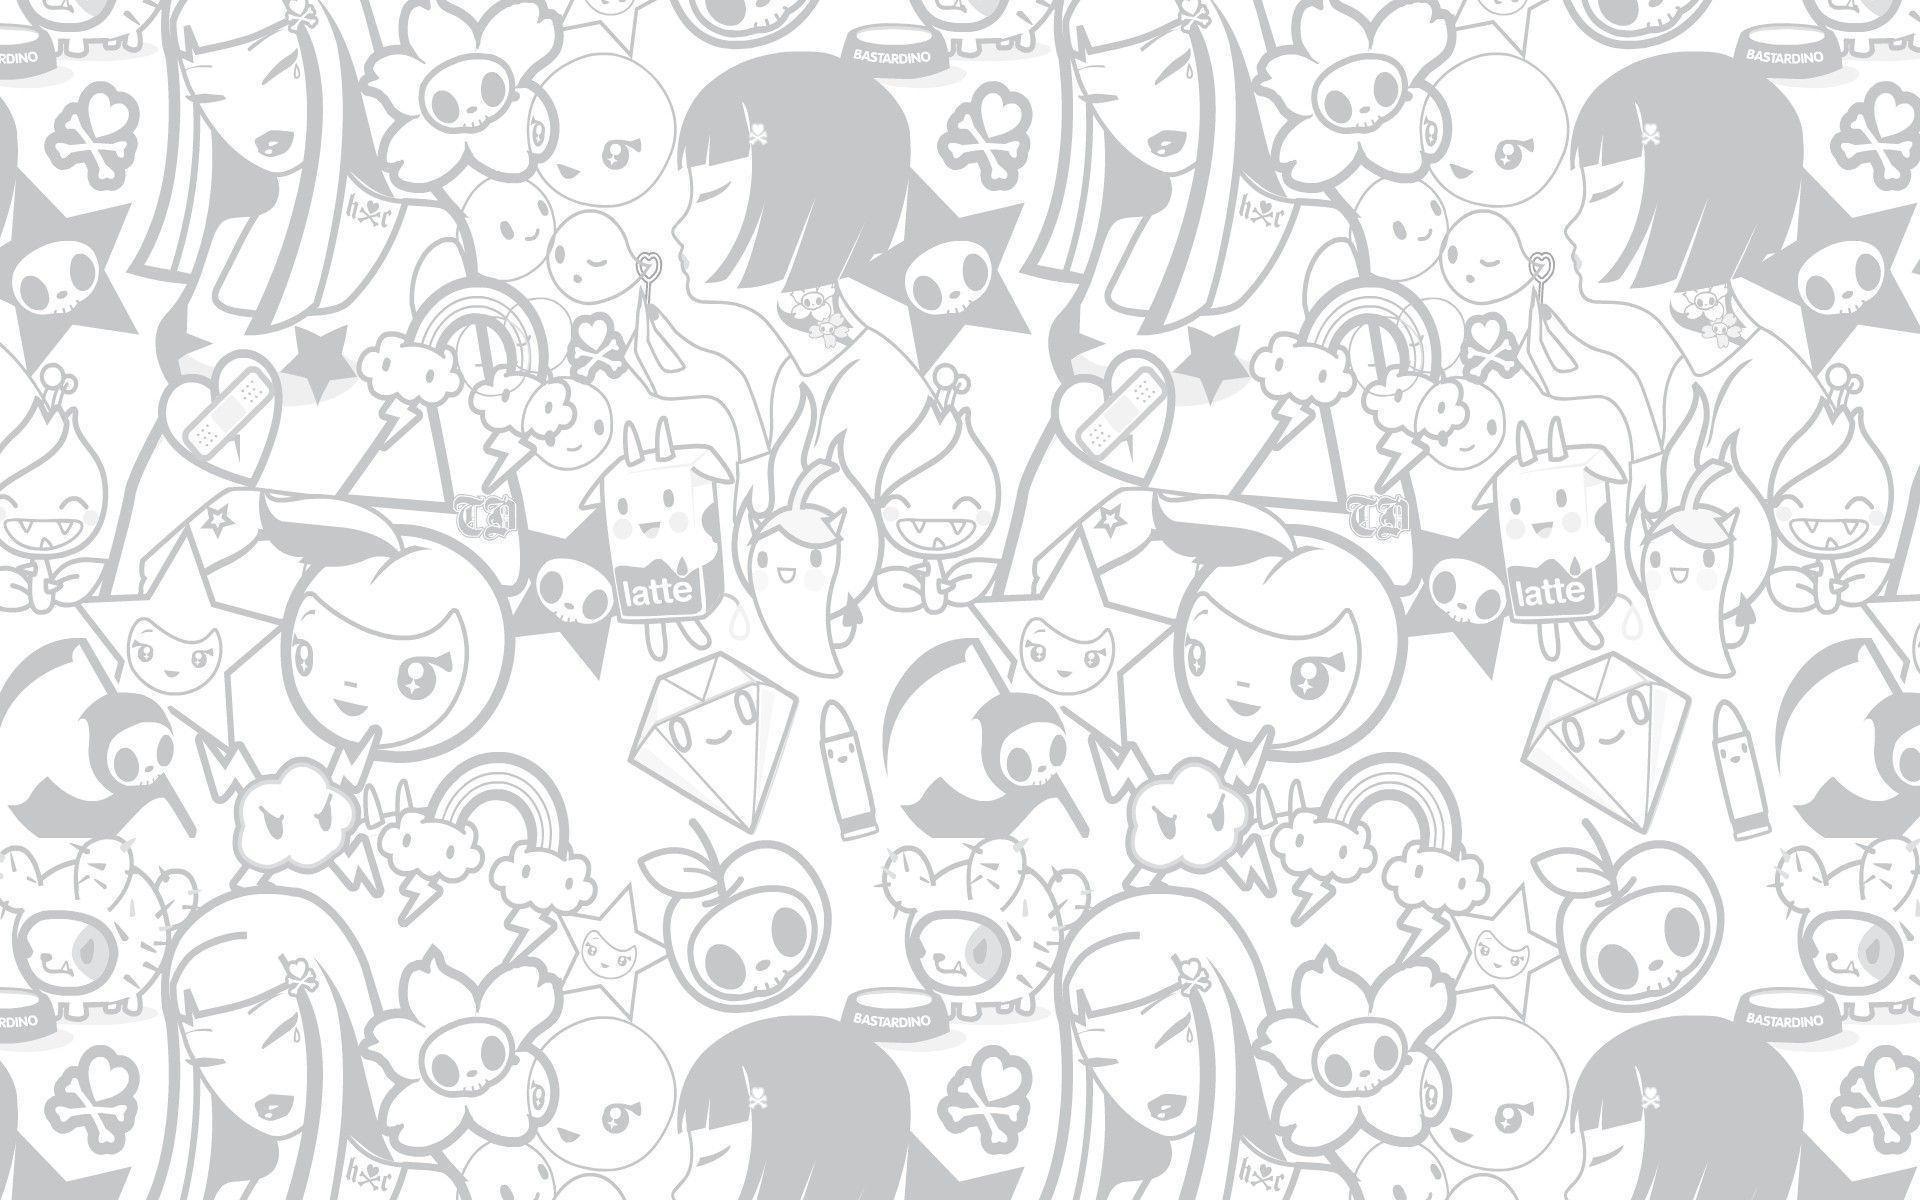 Kawaii girl anime wallpaper background 14 | Wallpaper